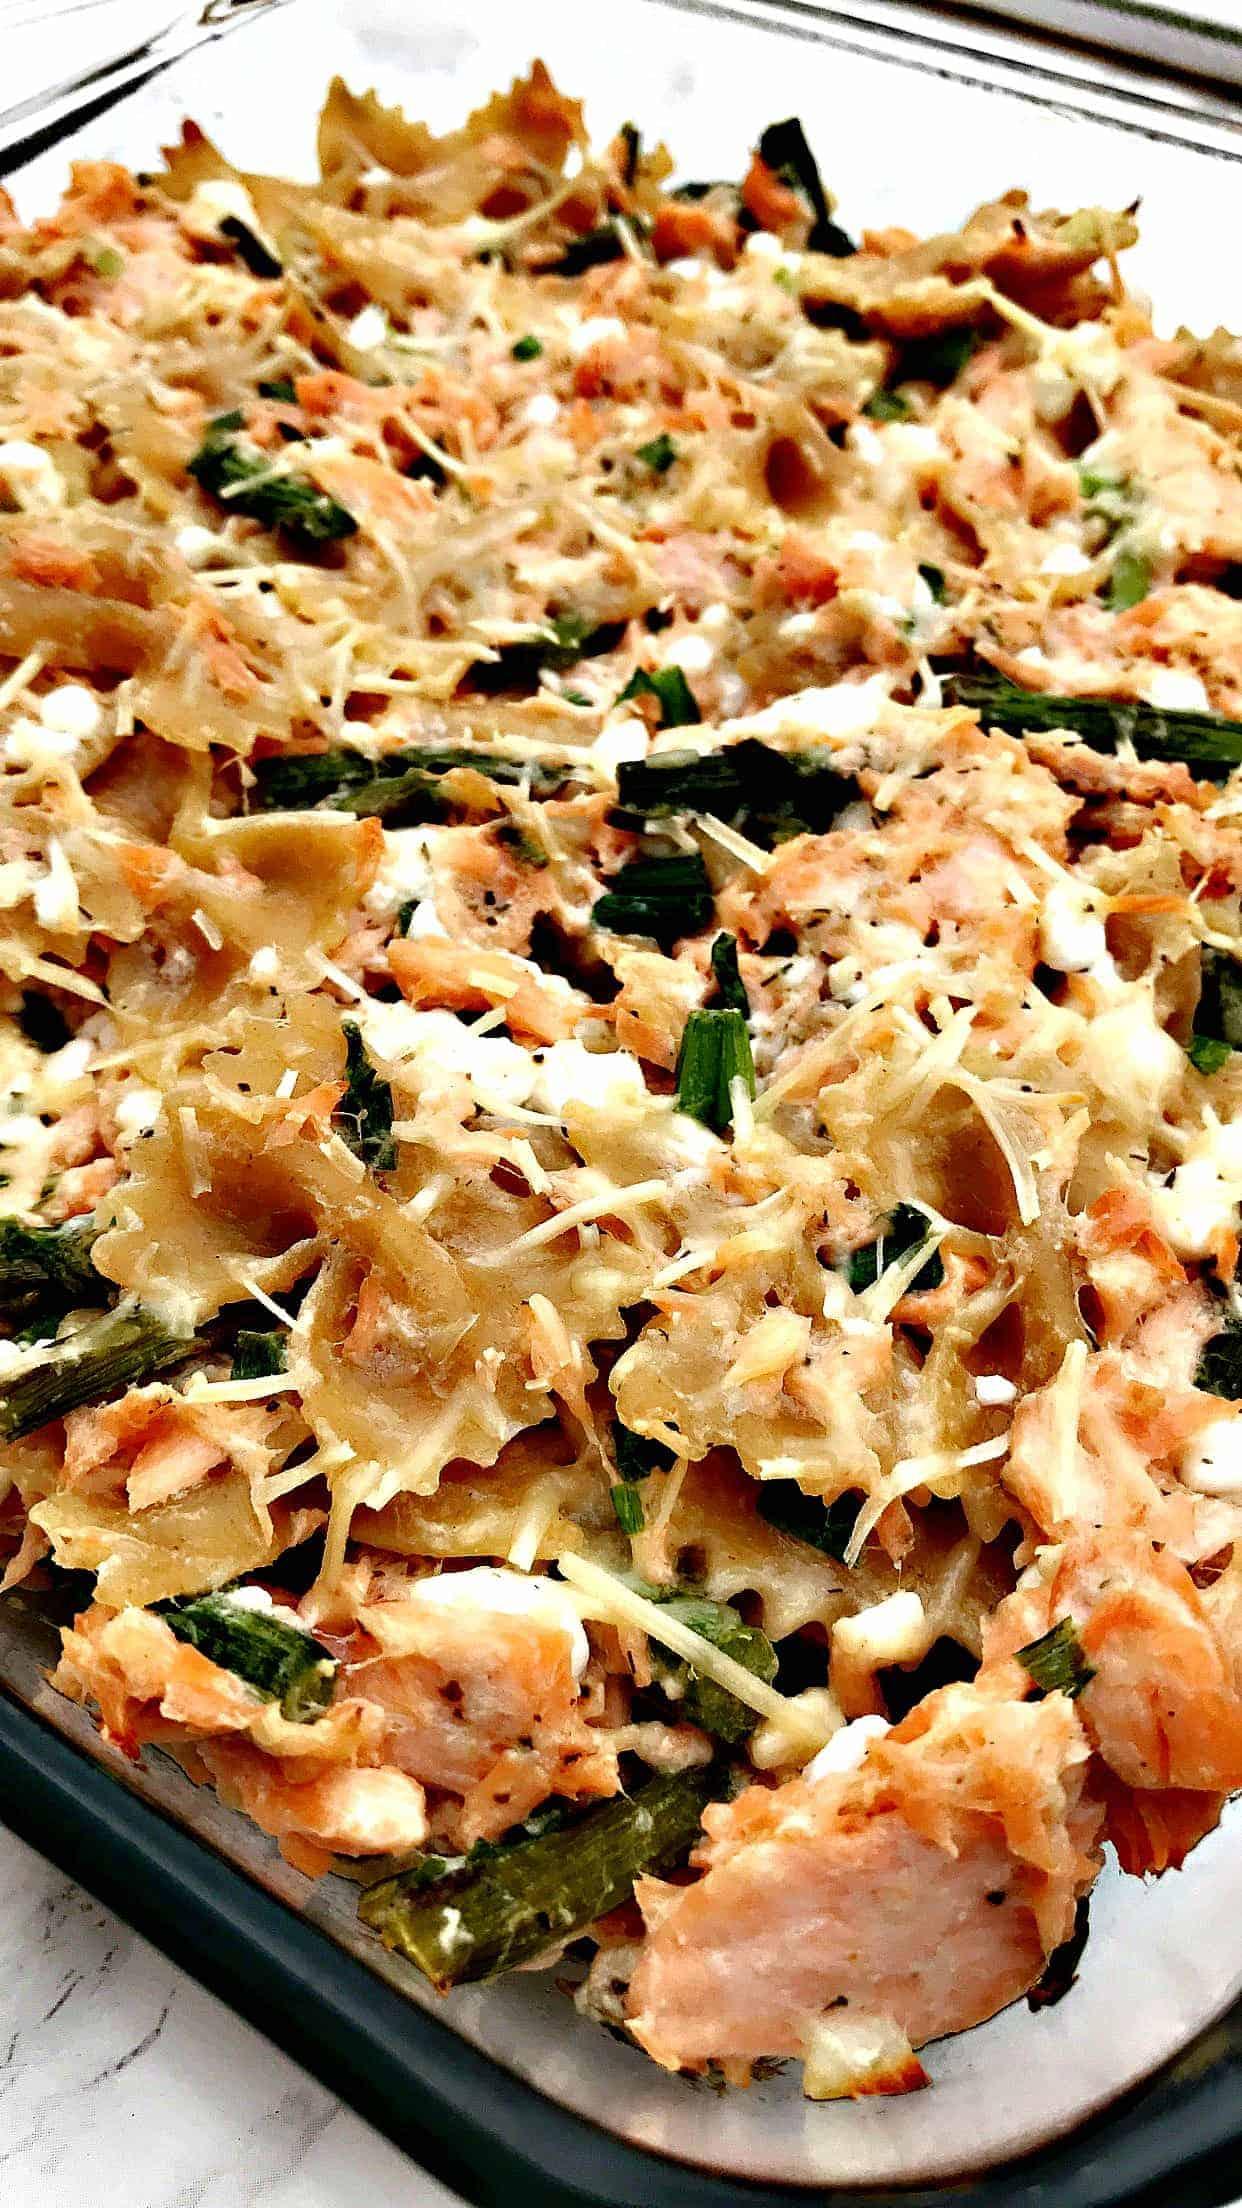 whole wheat salmon pasta in a baking dish